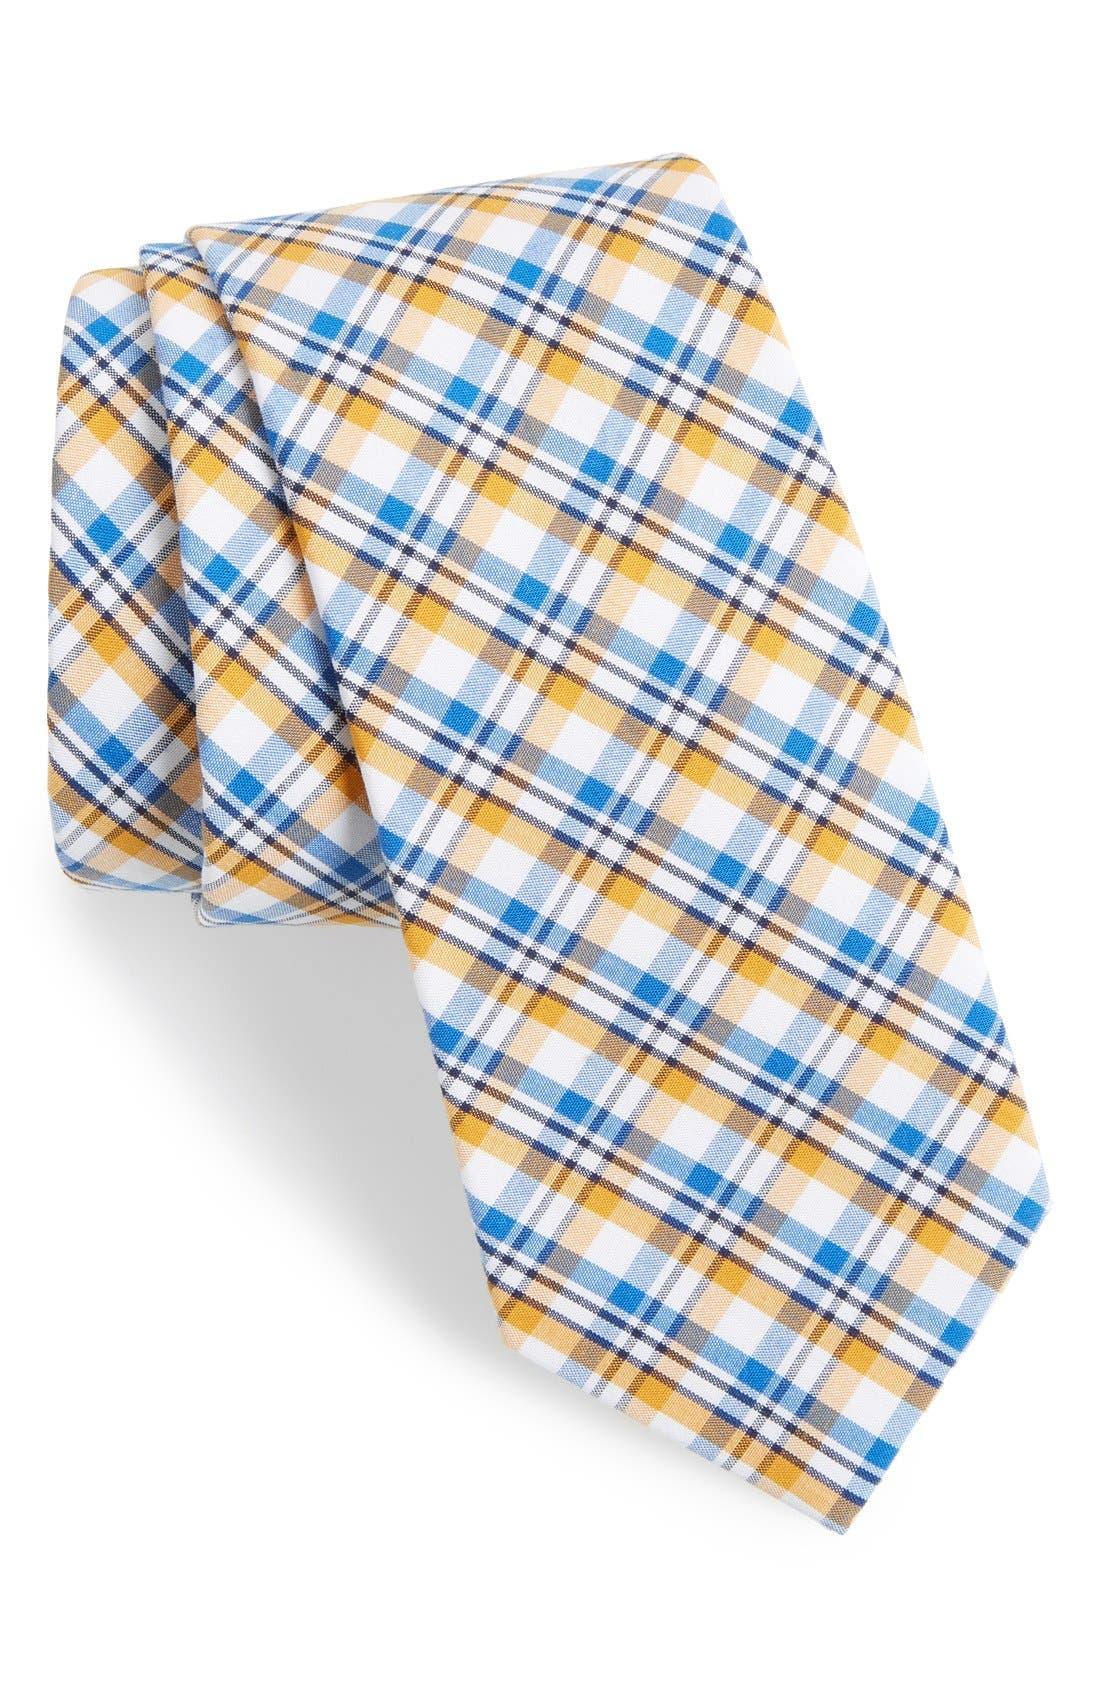 'Boomer' Plaid Cotton Tie,                             Main thumbnail 1, color,                             Yellow